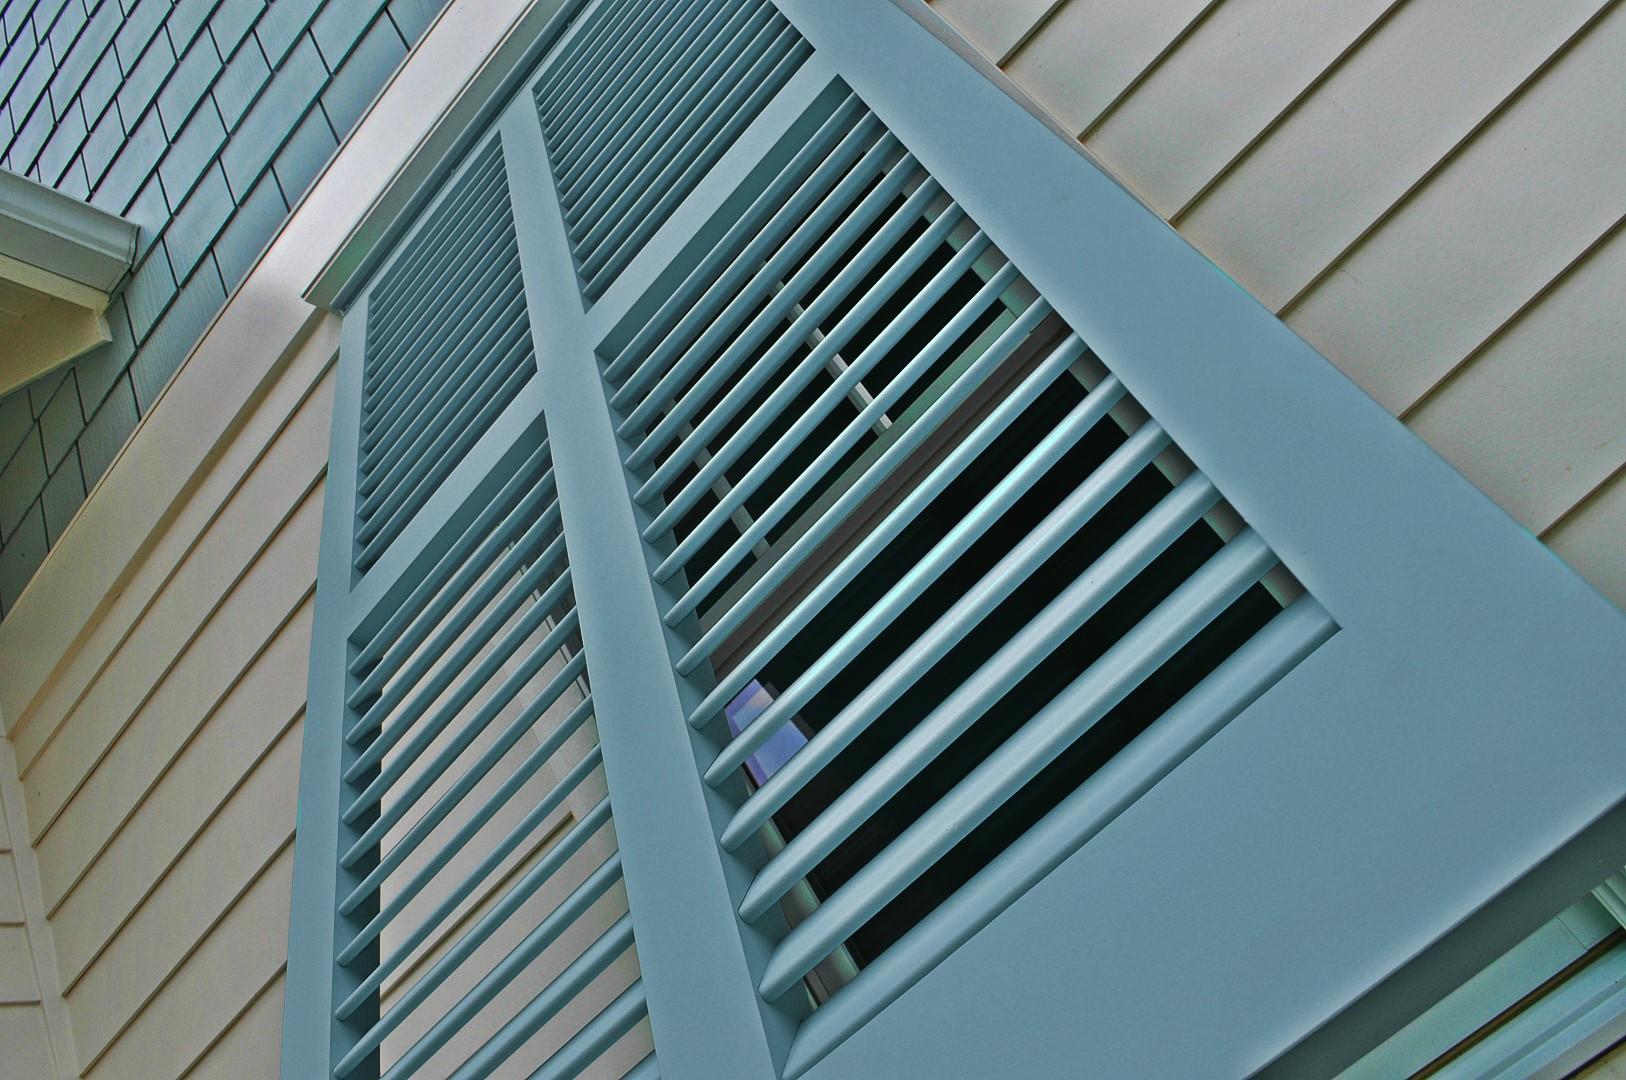 Window treatment idea - Bermuda or Bahama shutter for exterior.